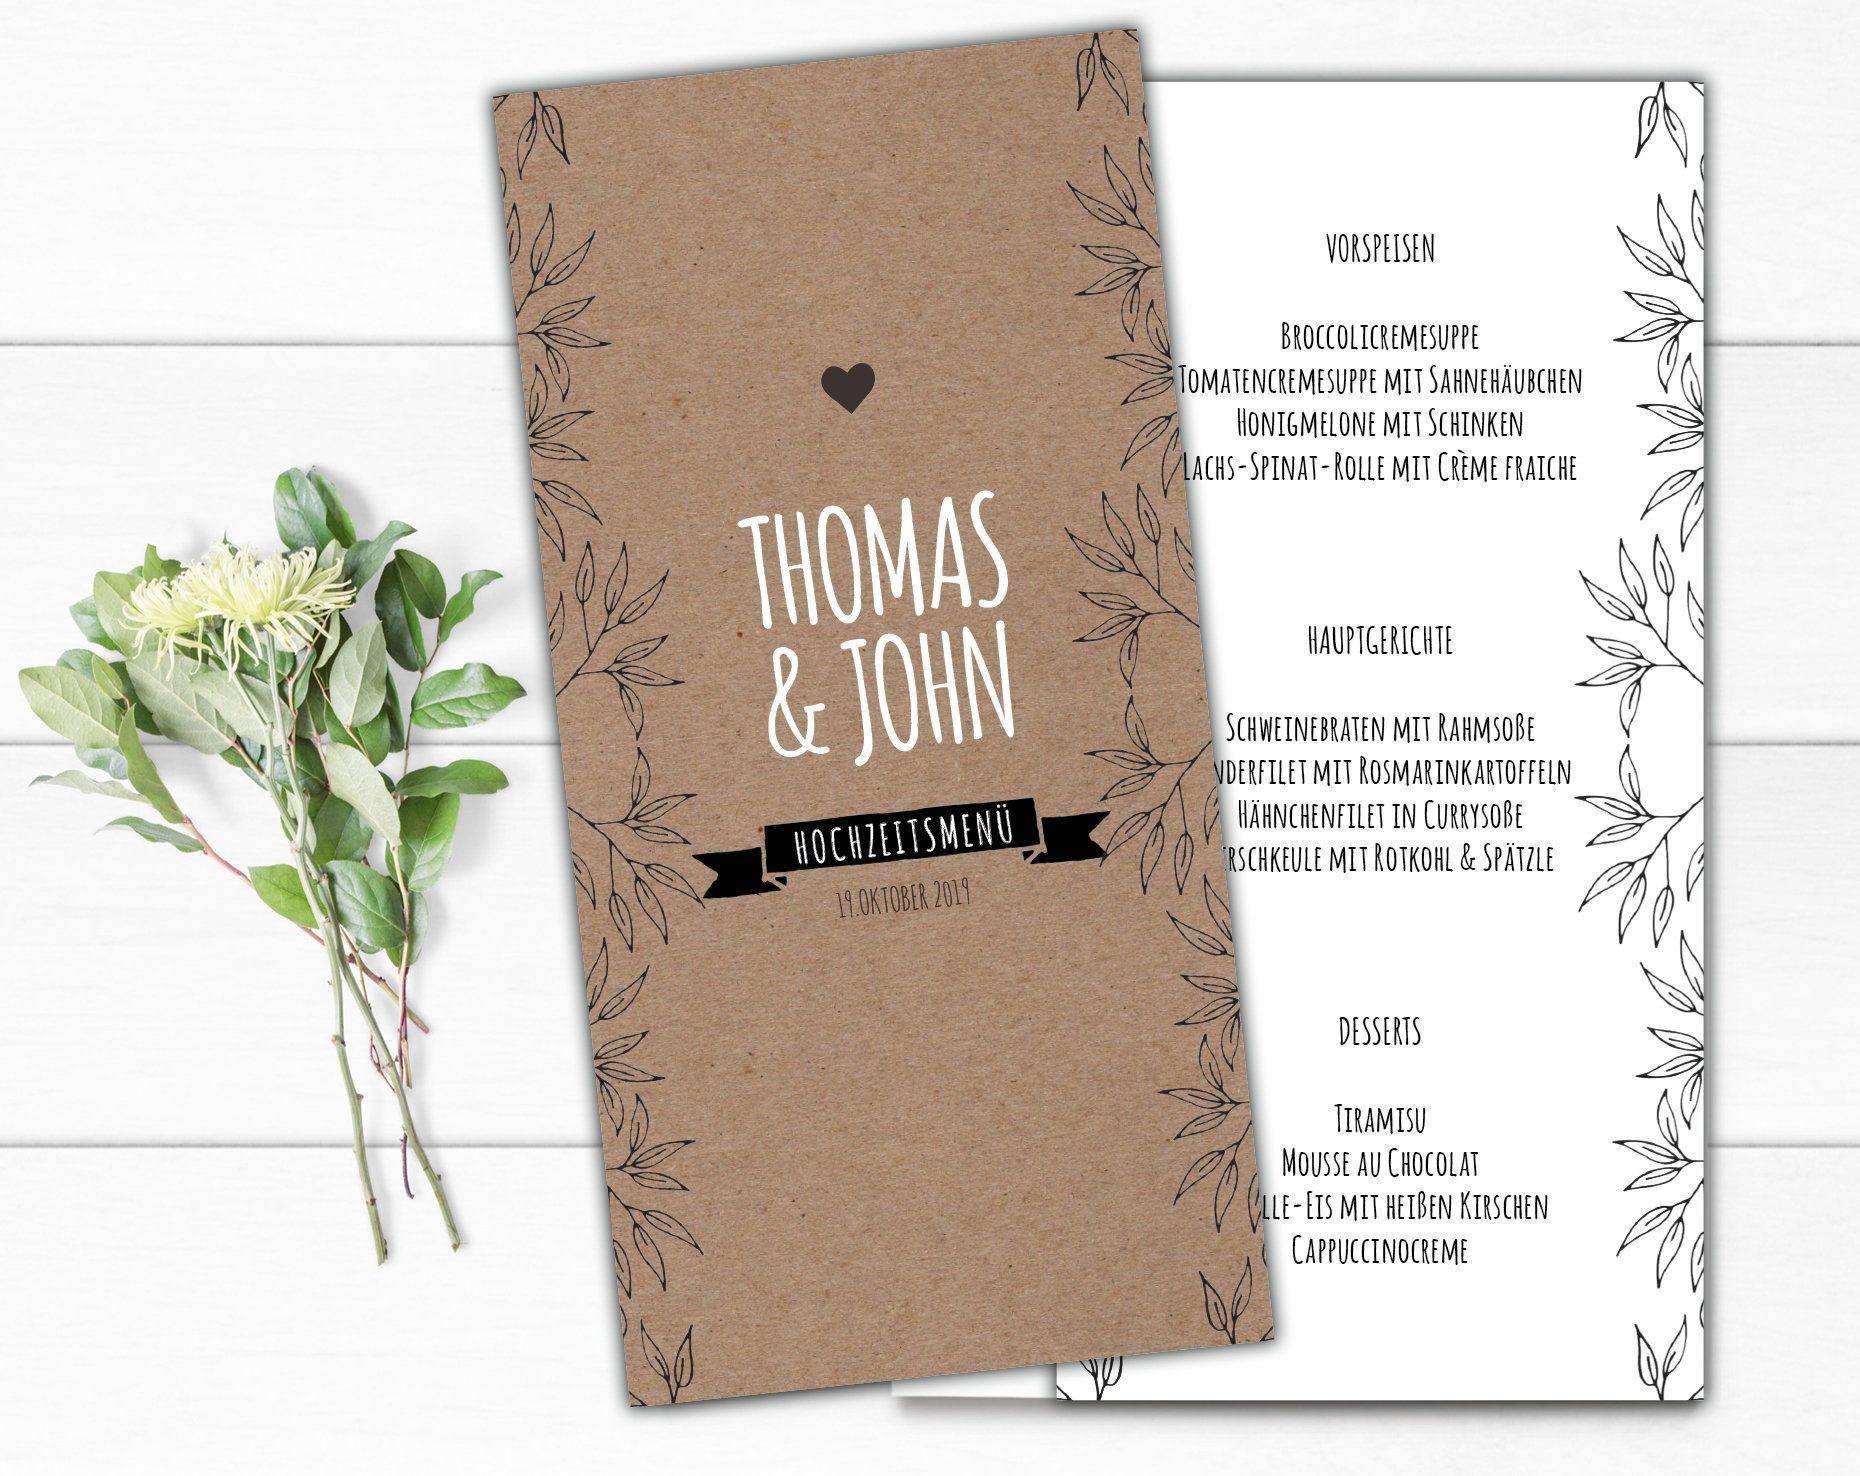 Menu Menu Wedding Drinks Menu Wedding Buffet Menu Wedding Menu Wedding Wedding Menu Self Print Table Cards Wedding Menu Drink Menu Buffet